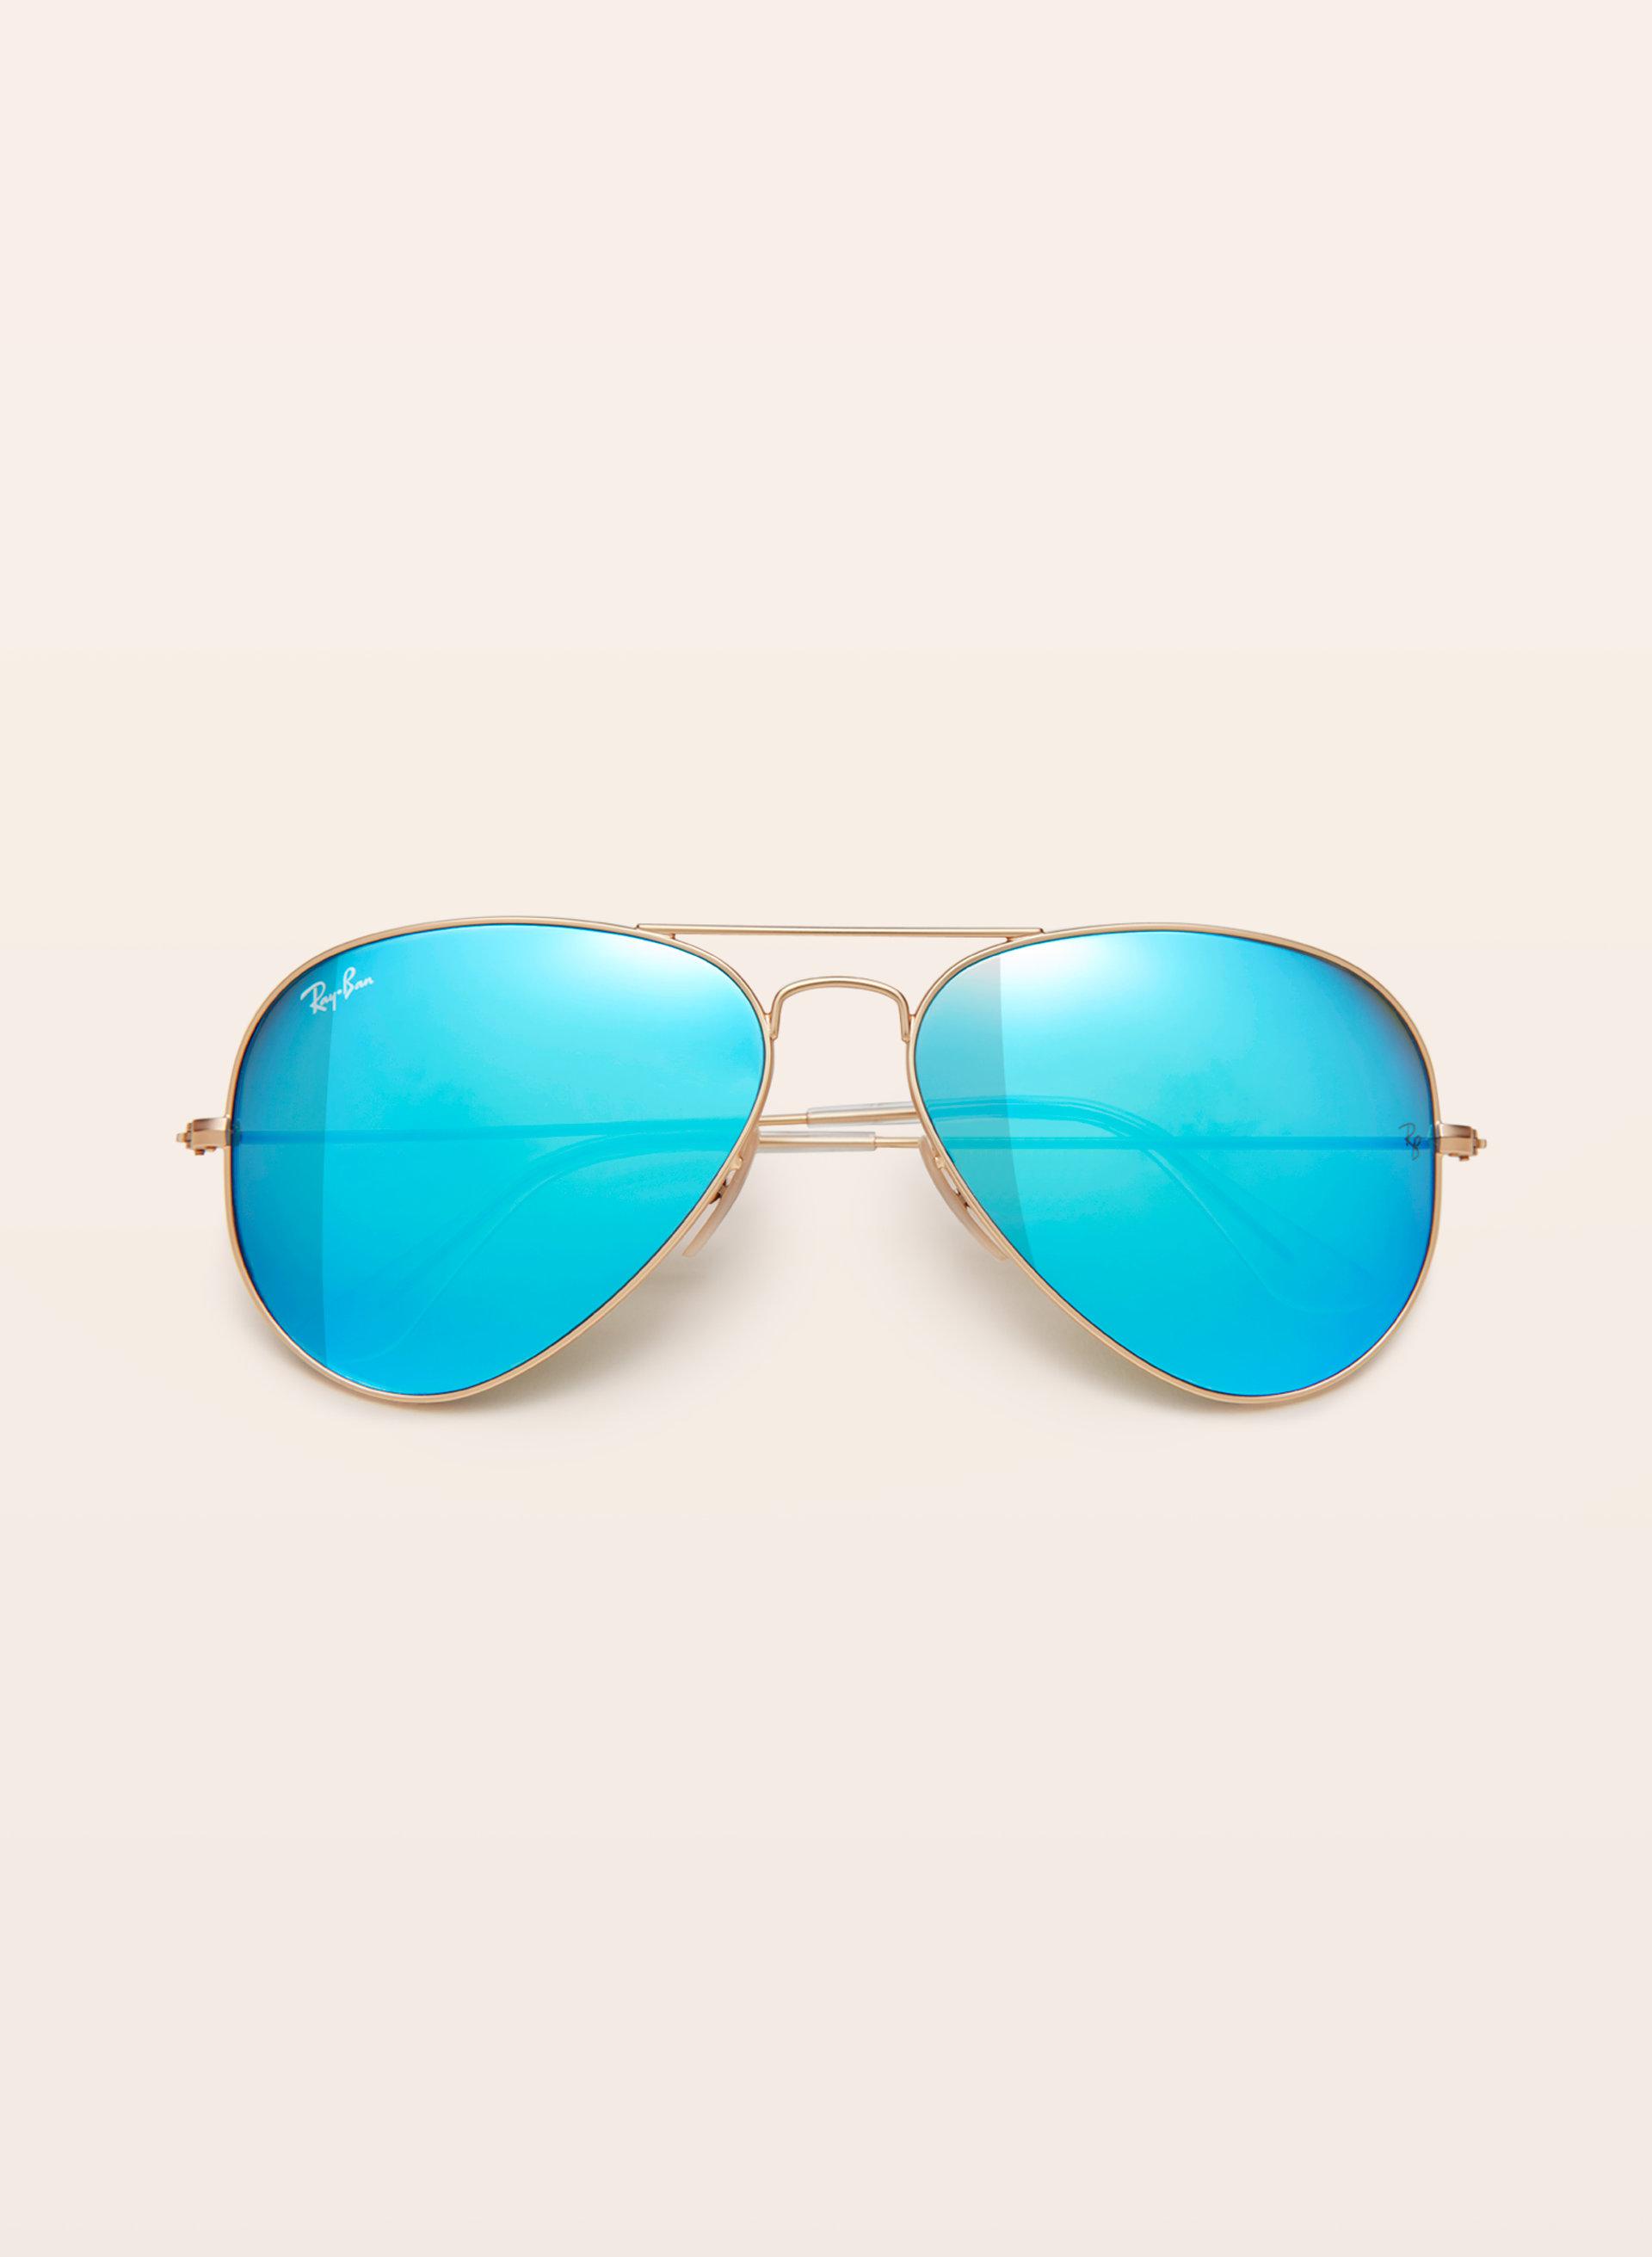 ray ban sonnenbrille frauen aviator blau polarized